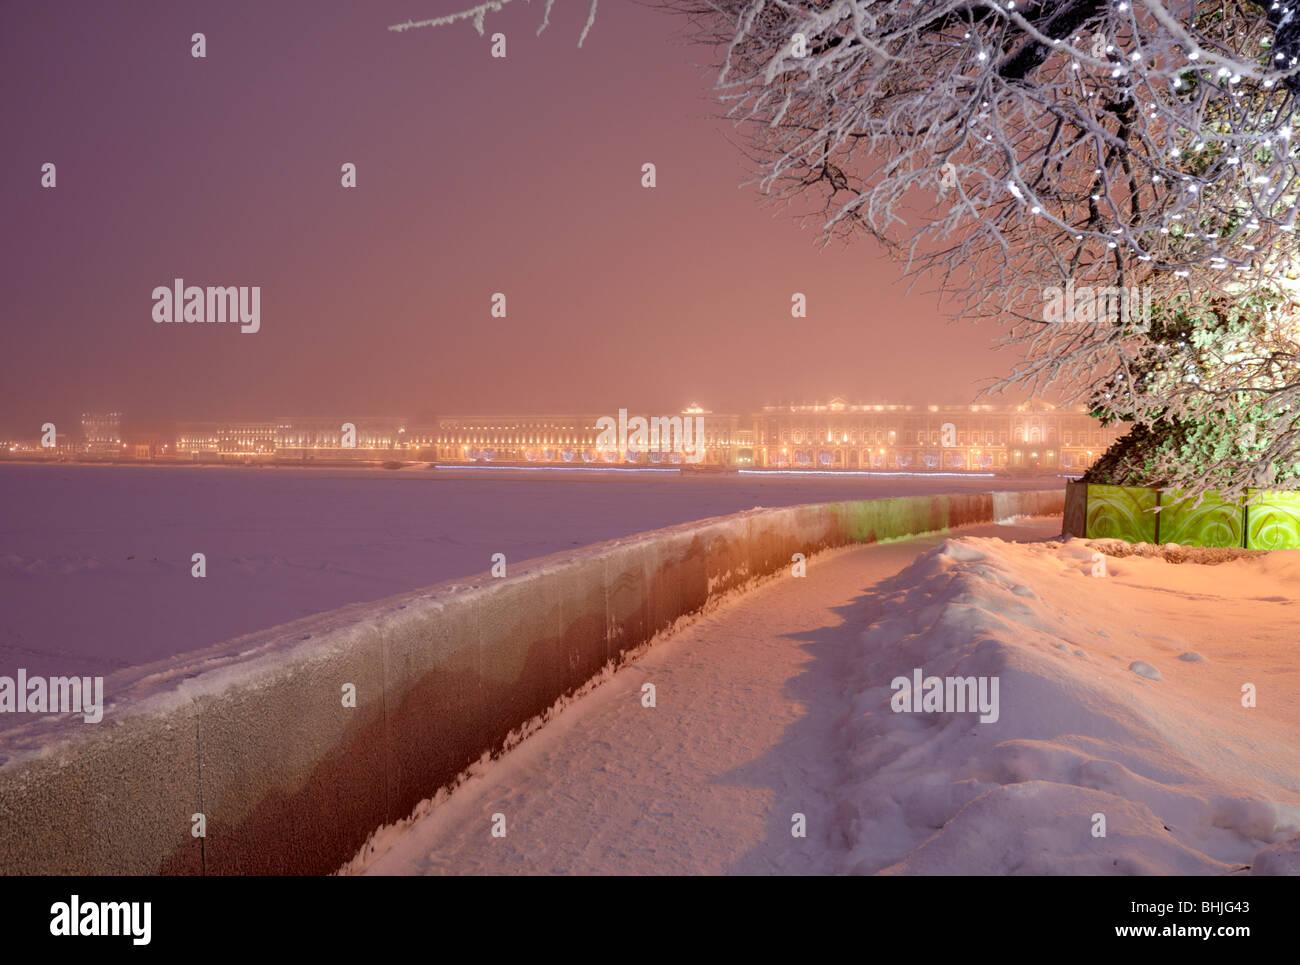 New Year illumination at the Spit of Vasilyevsky Island and Neva river Embankment. - Stock Image